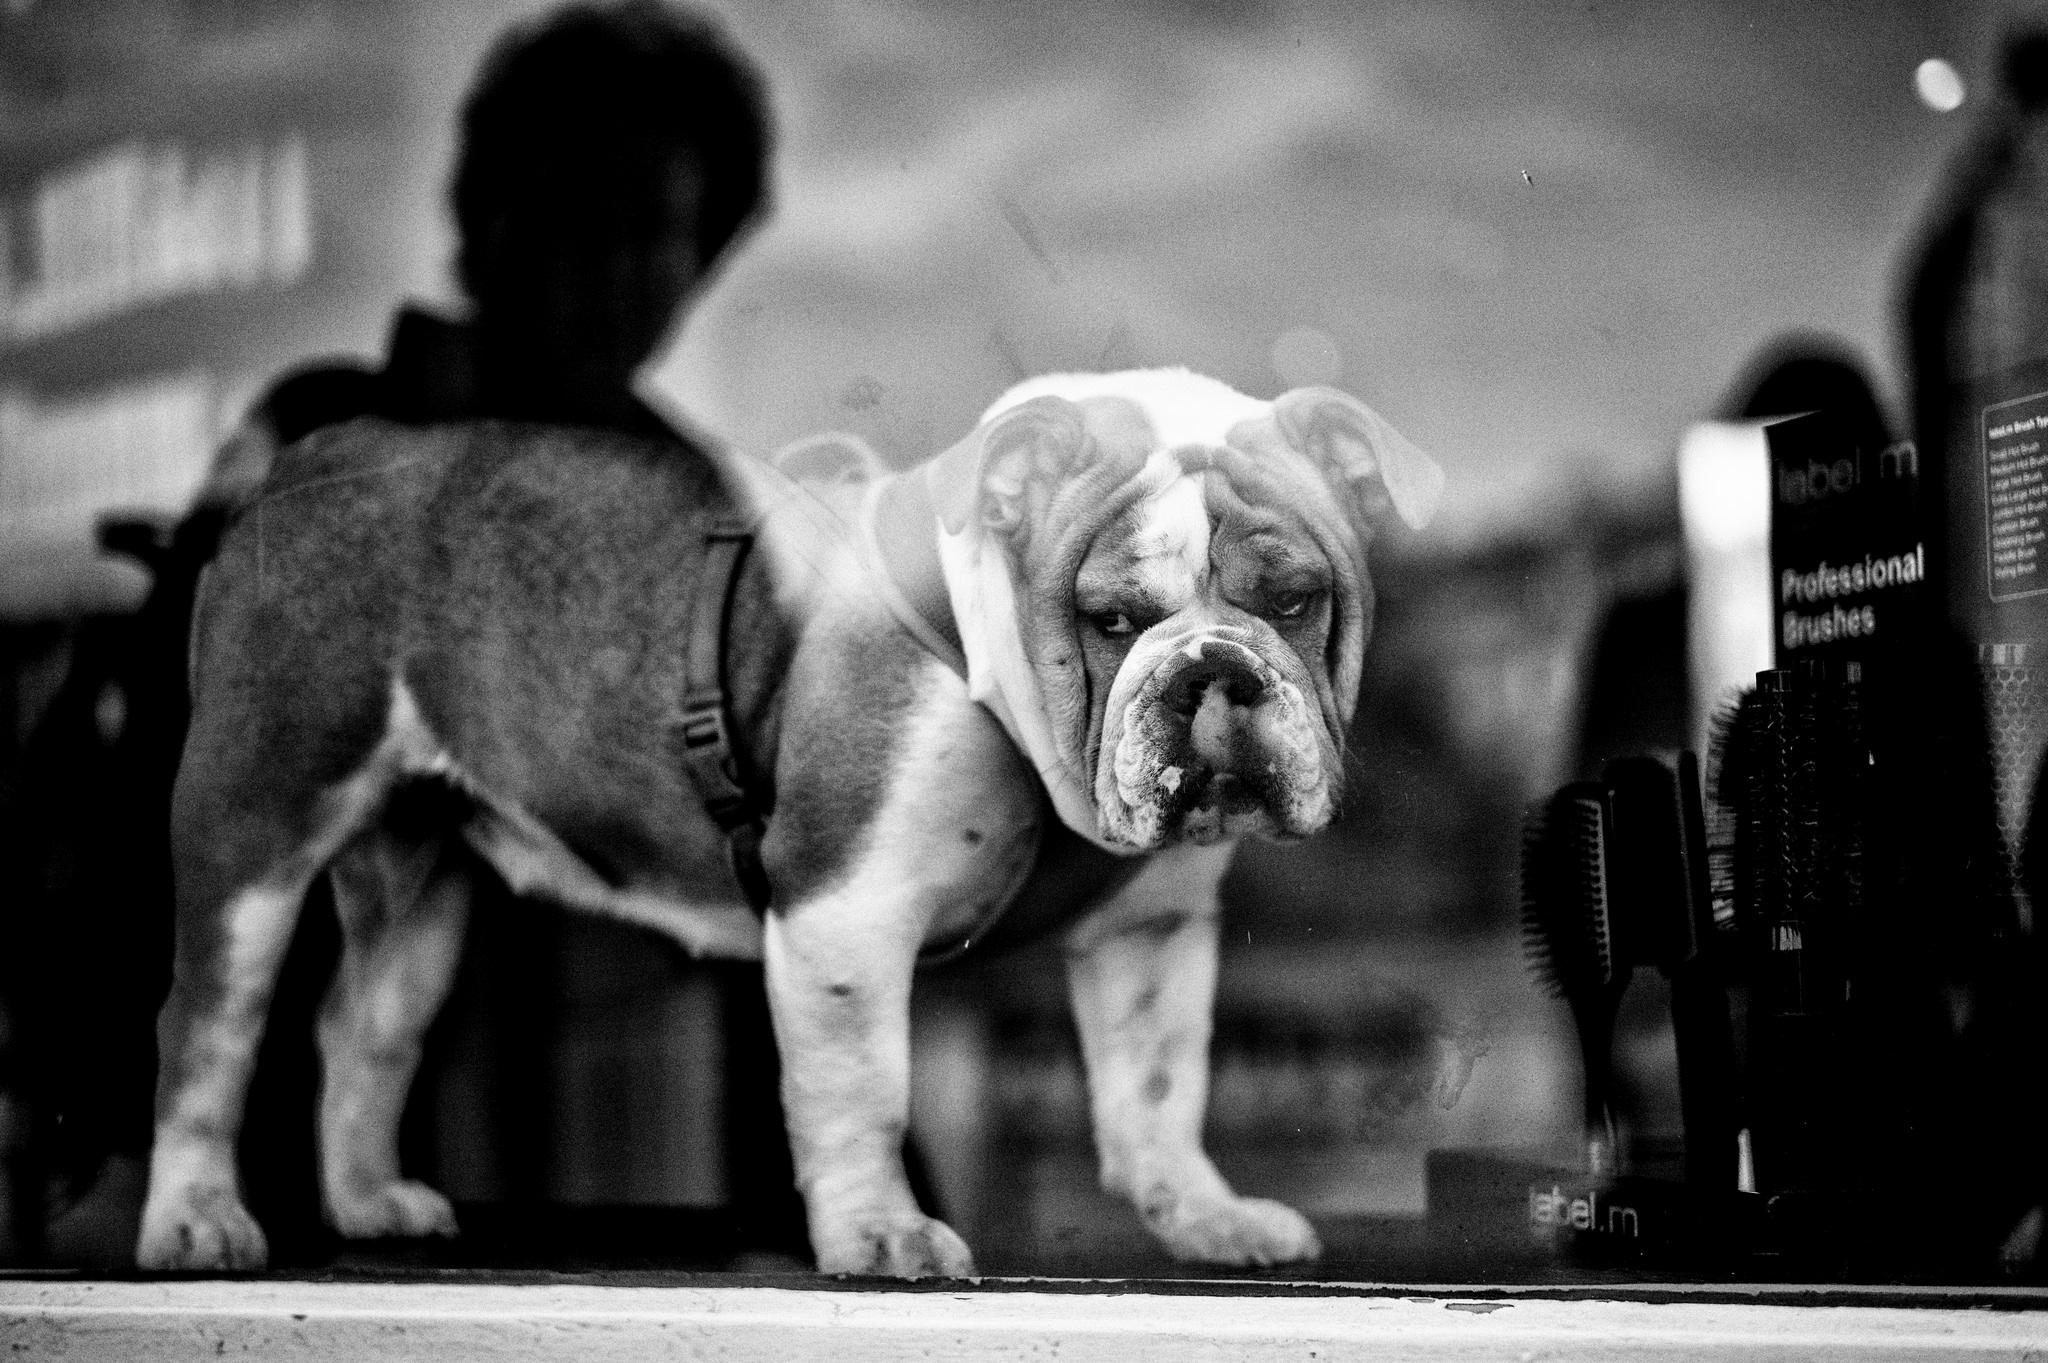 Una Street Photography a… quattro zampe!